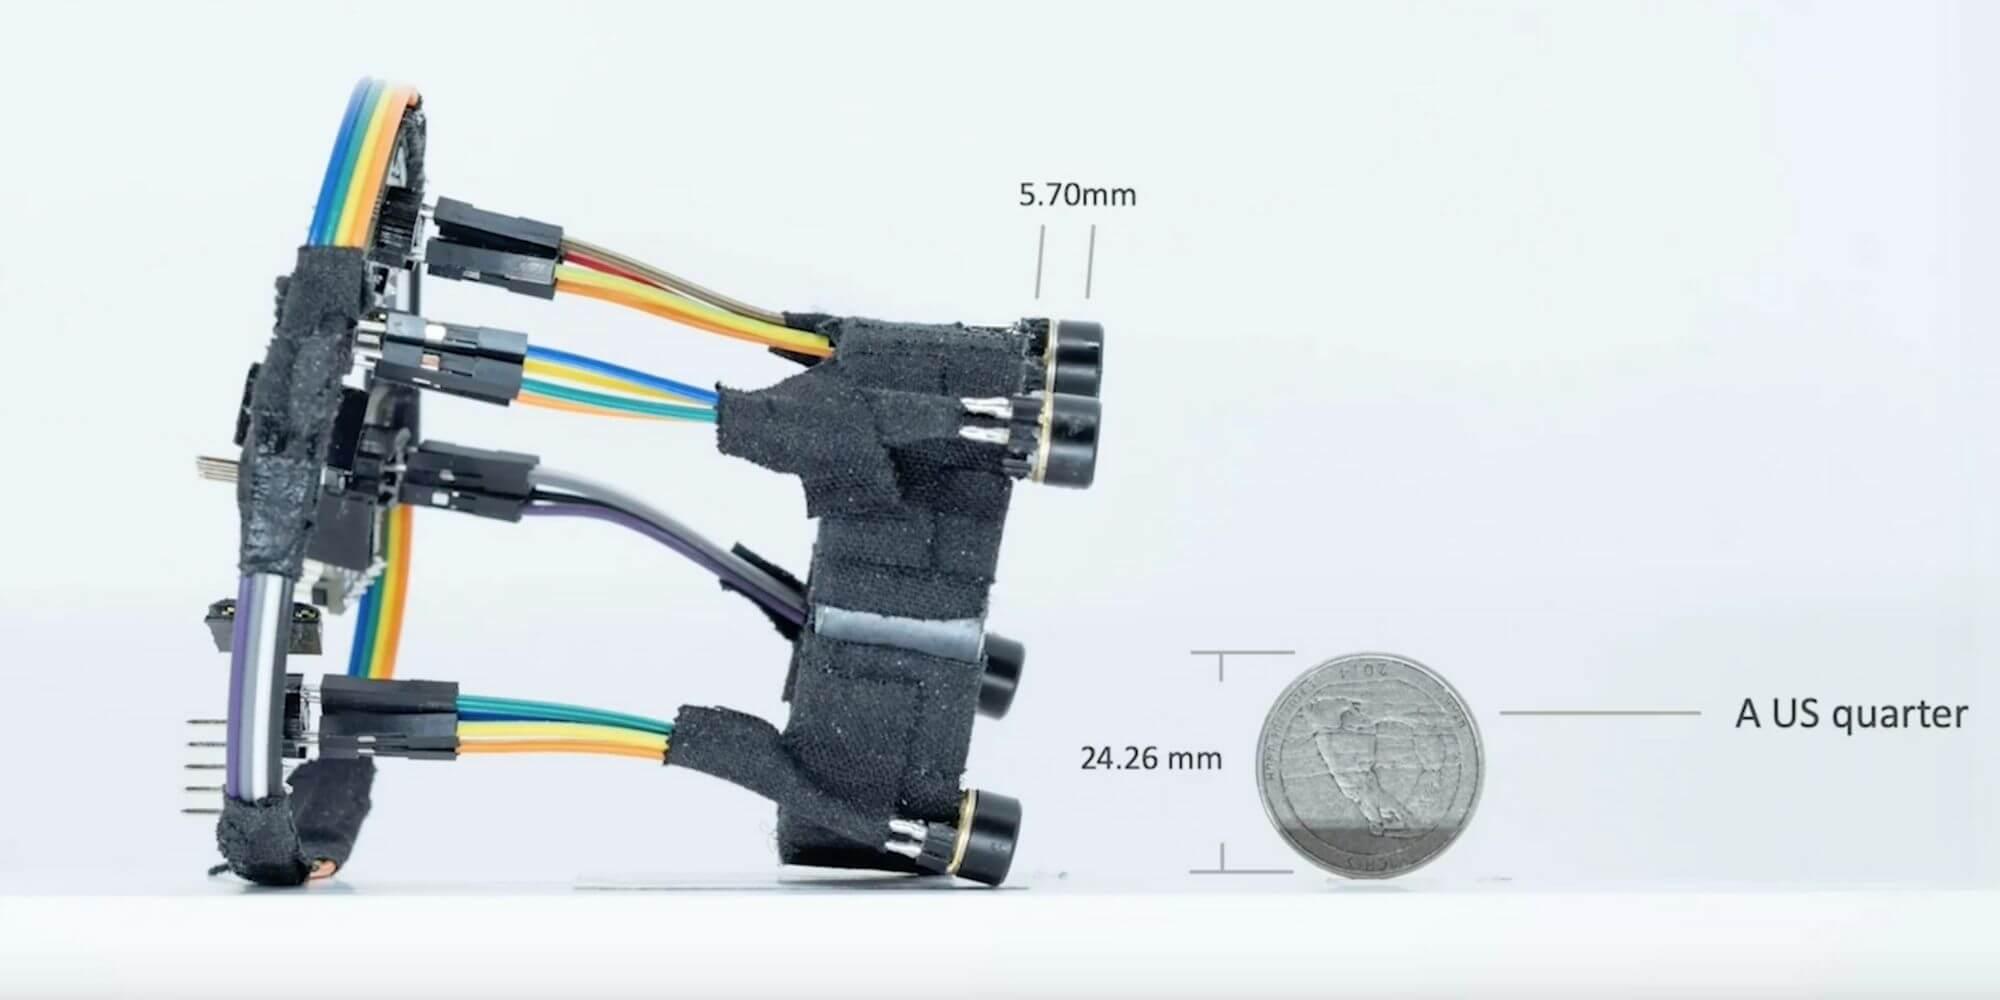 AR hand tracker